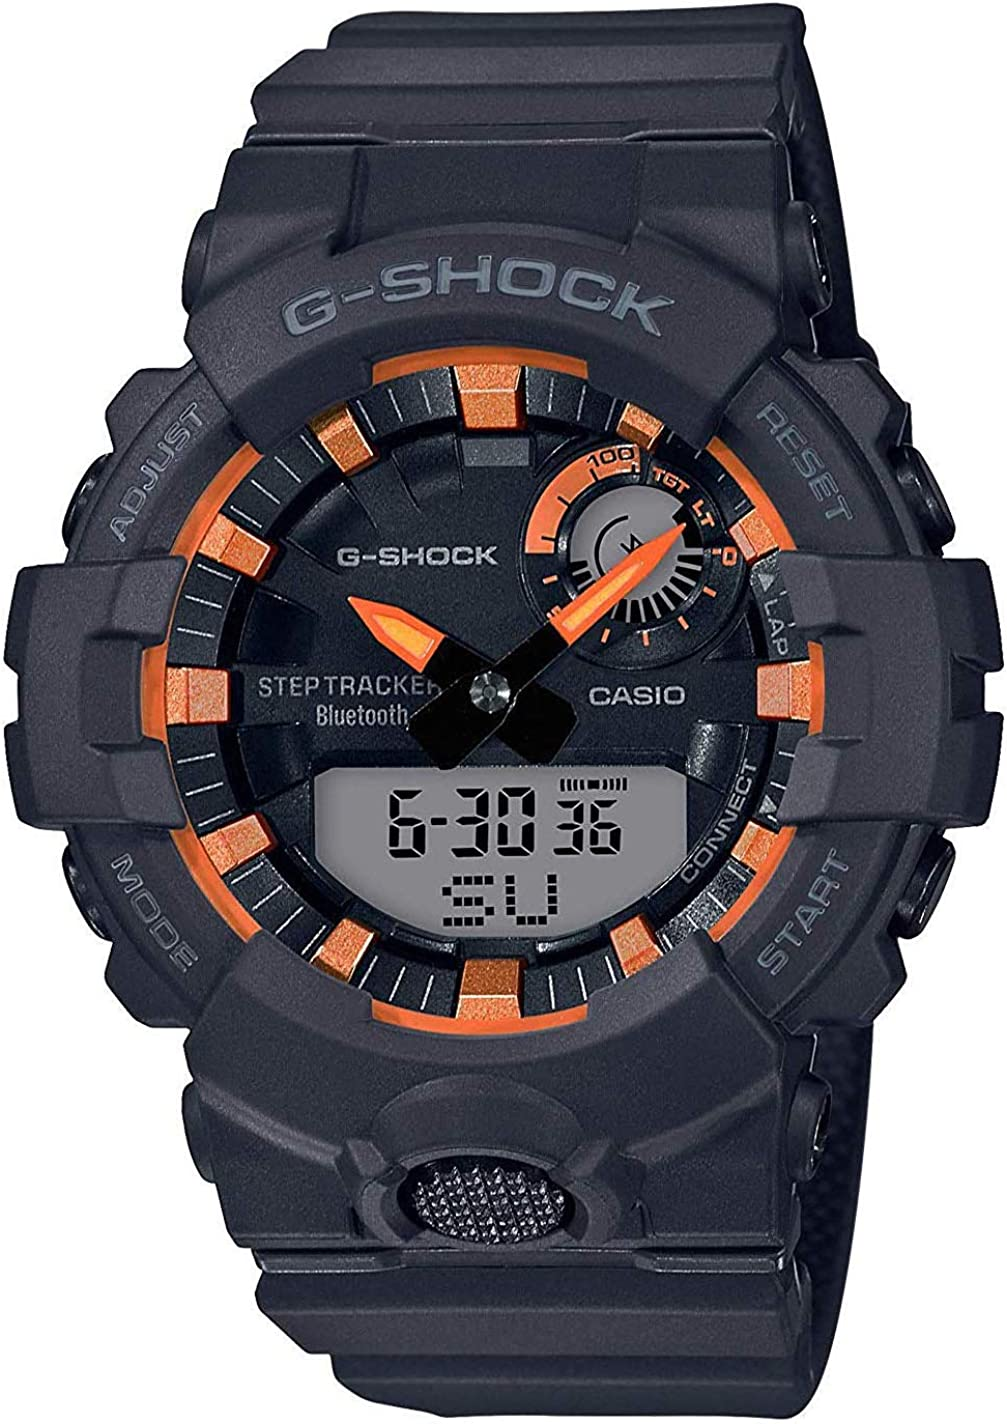 Casio G-Shock Men's GBA800SF-1A Analog-Digital Watch Black